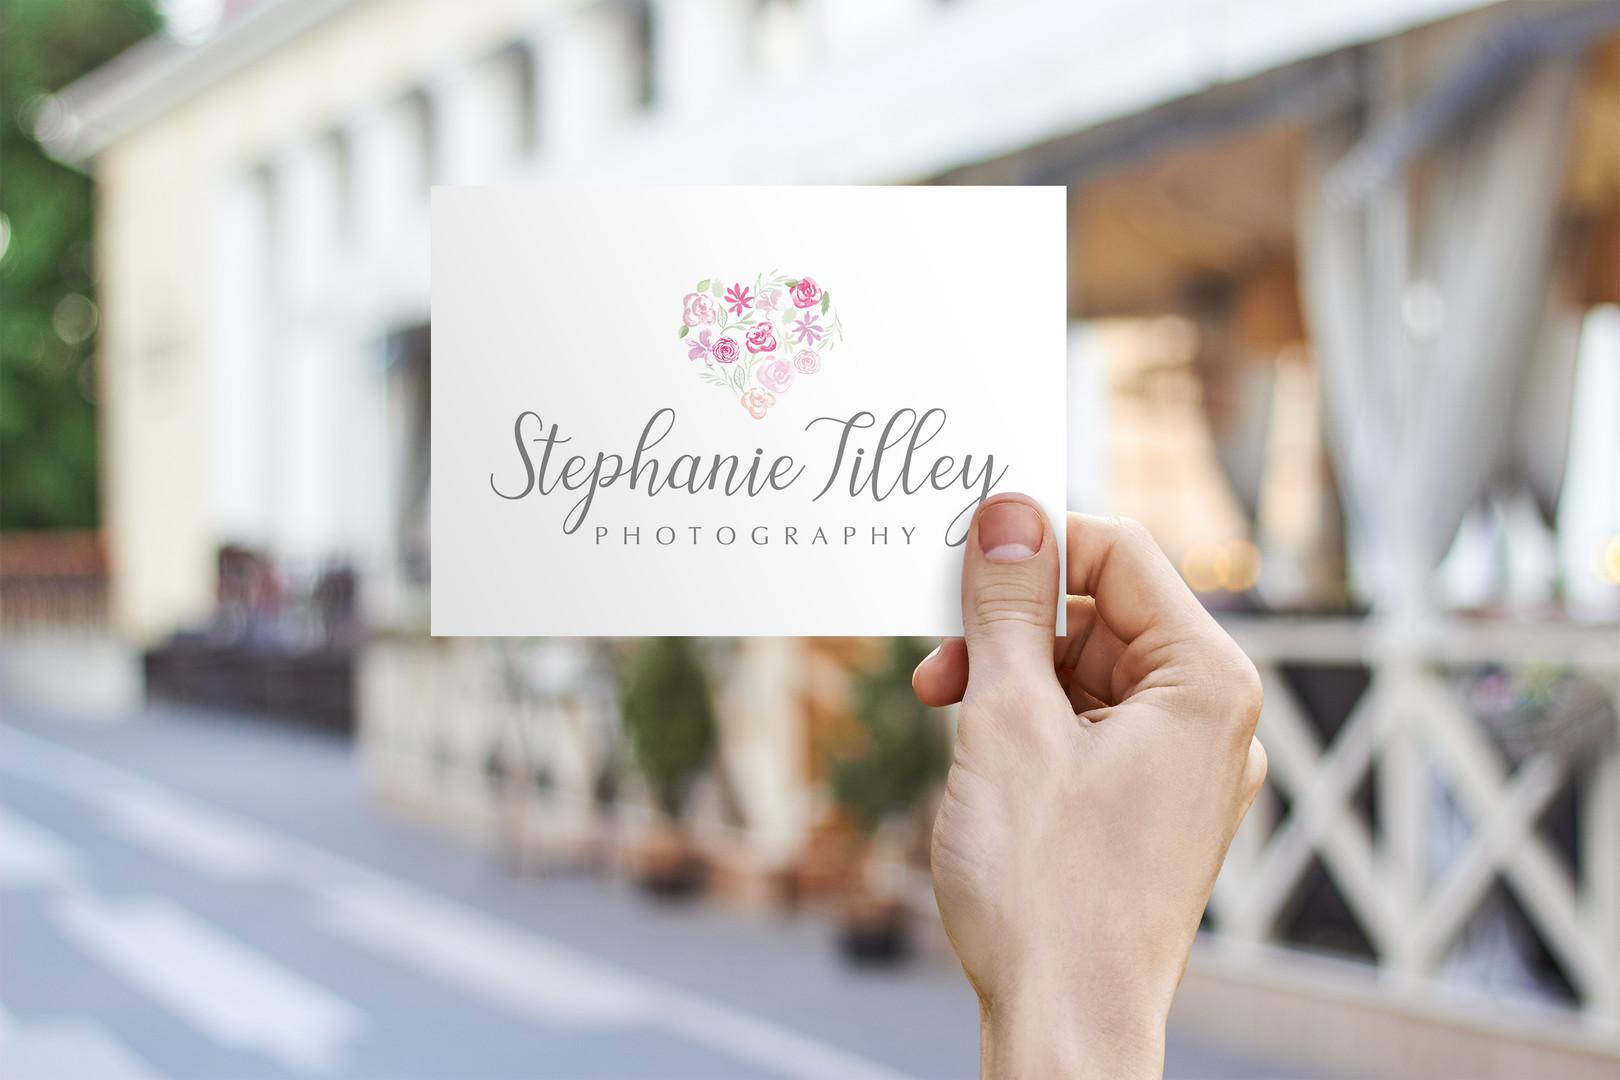 stephanie-tilley-logo.jpg